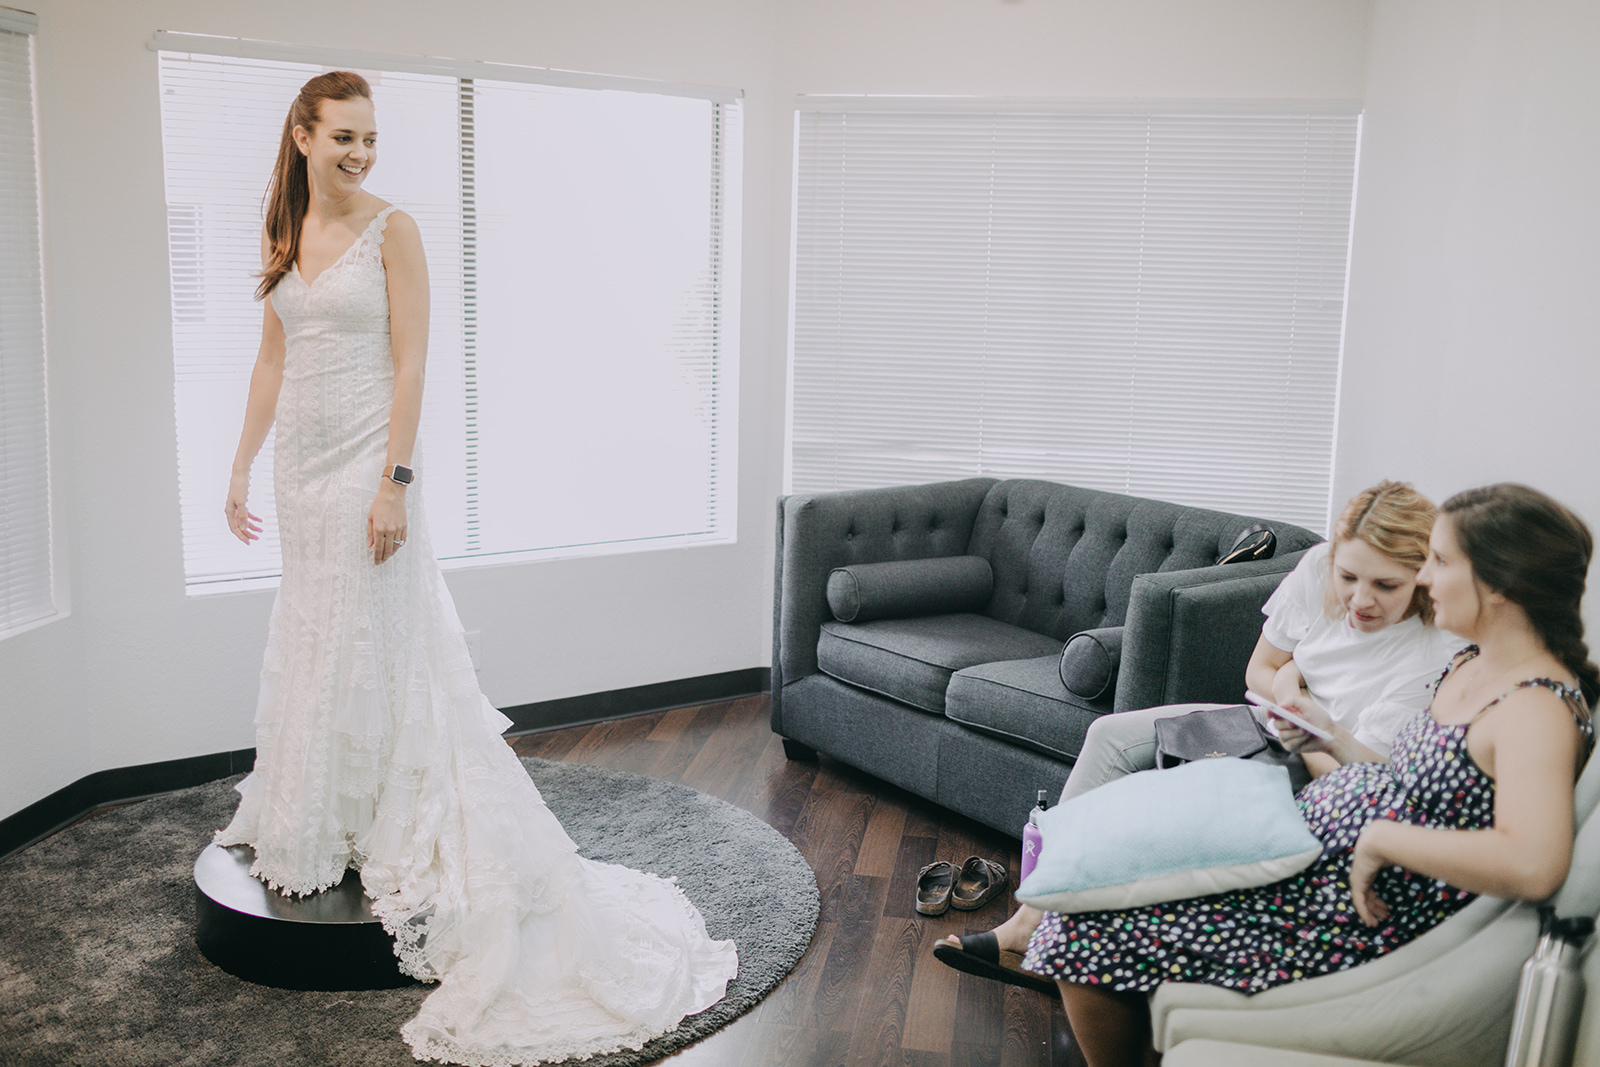 2018 0708 Brilliant Bridal 0053.jpg